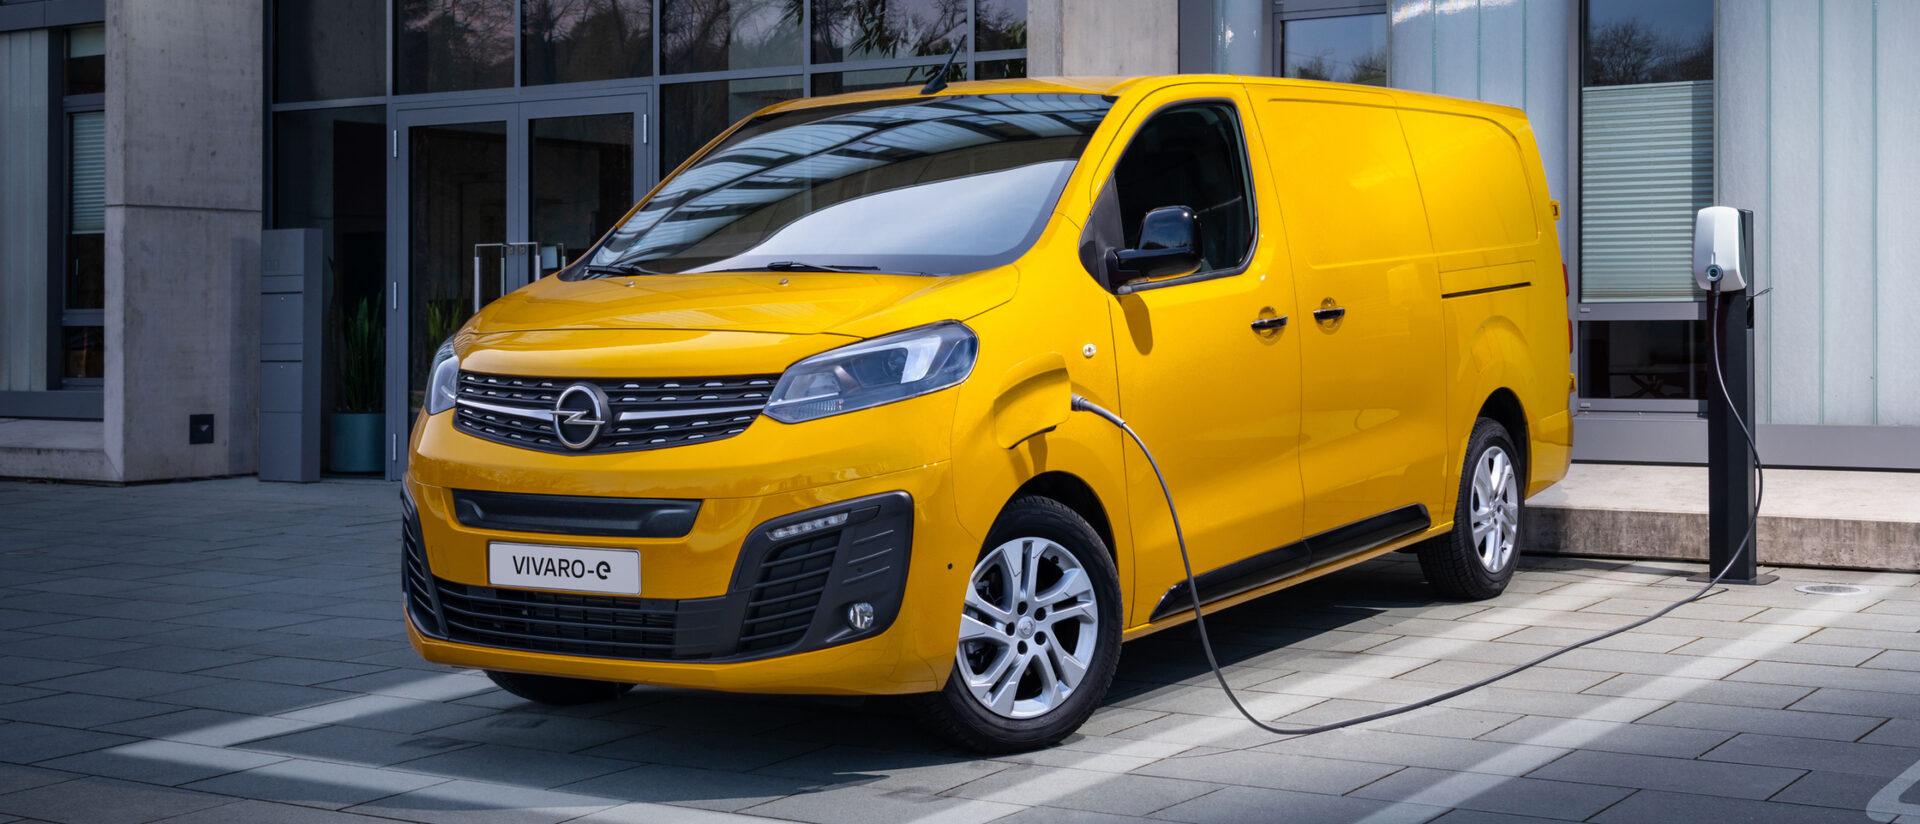 Opel Vivaro-e: Fully Electric.